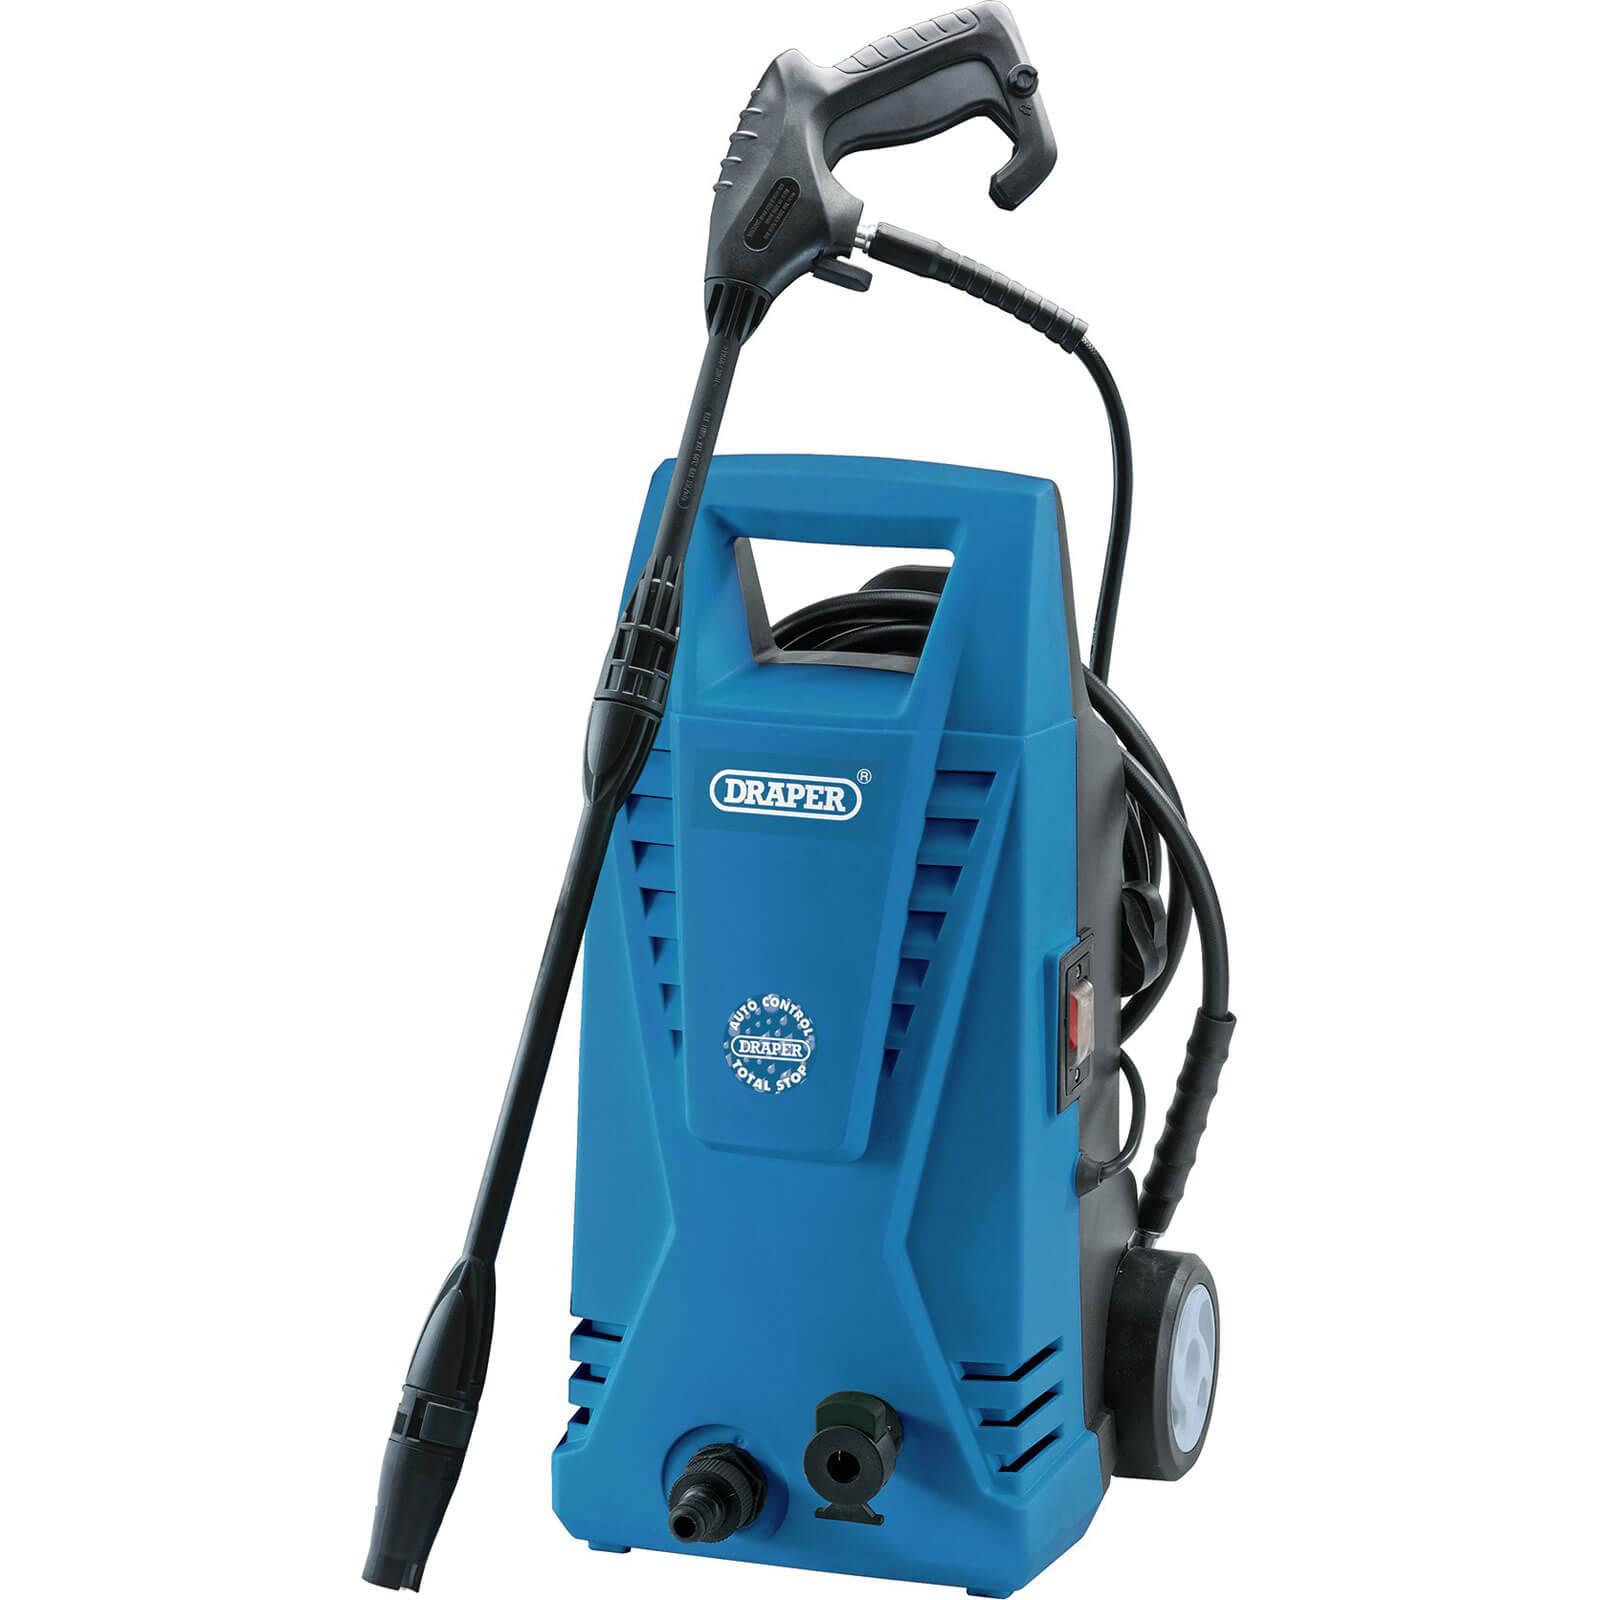 Draper Pressure Washer 1500W